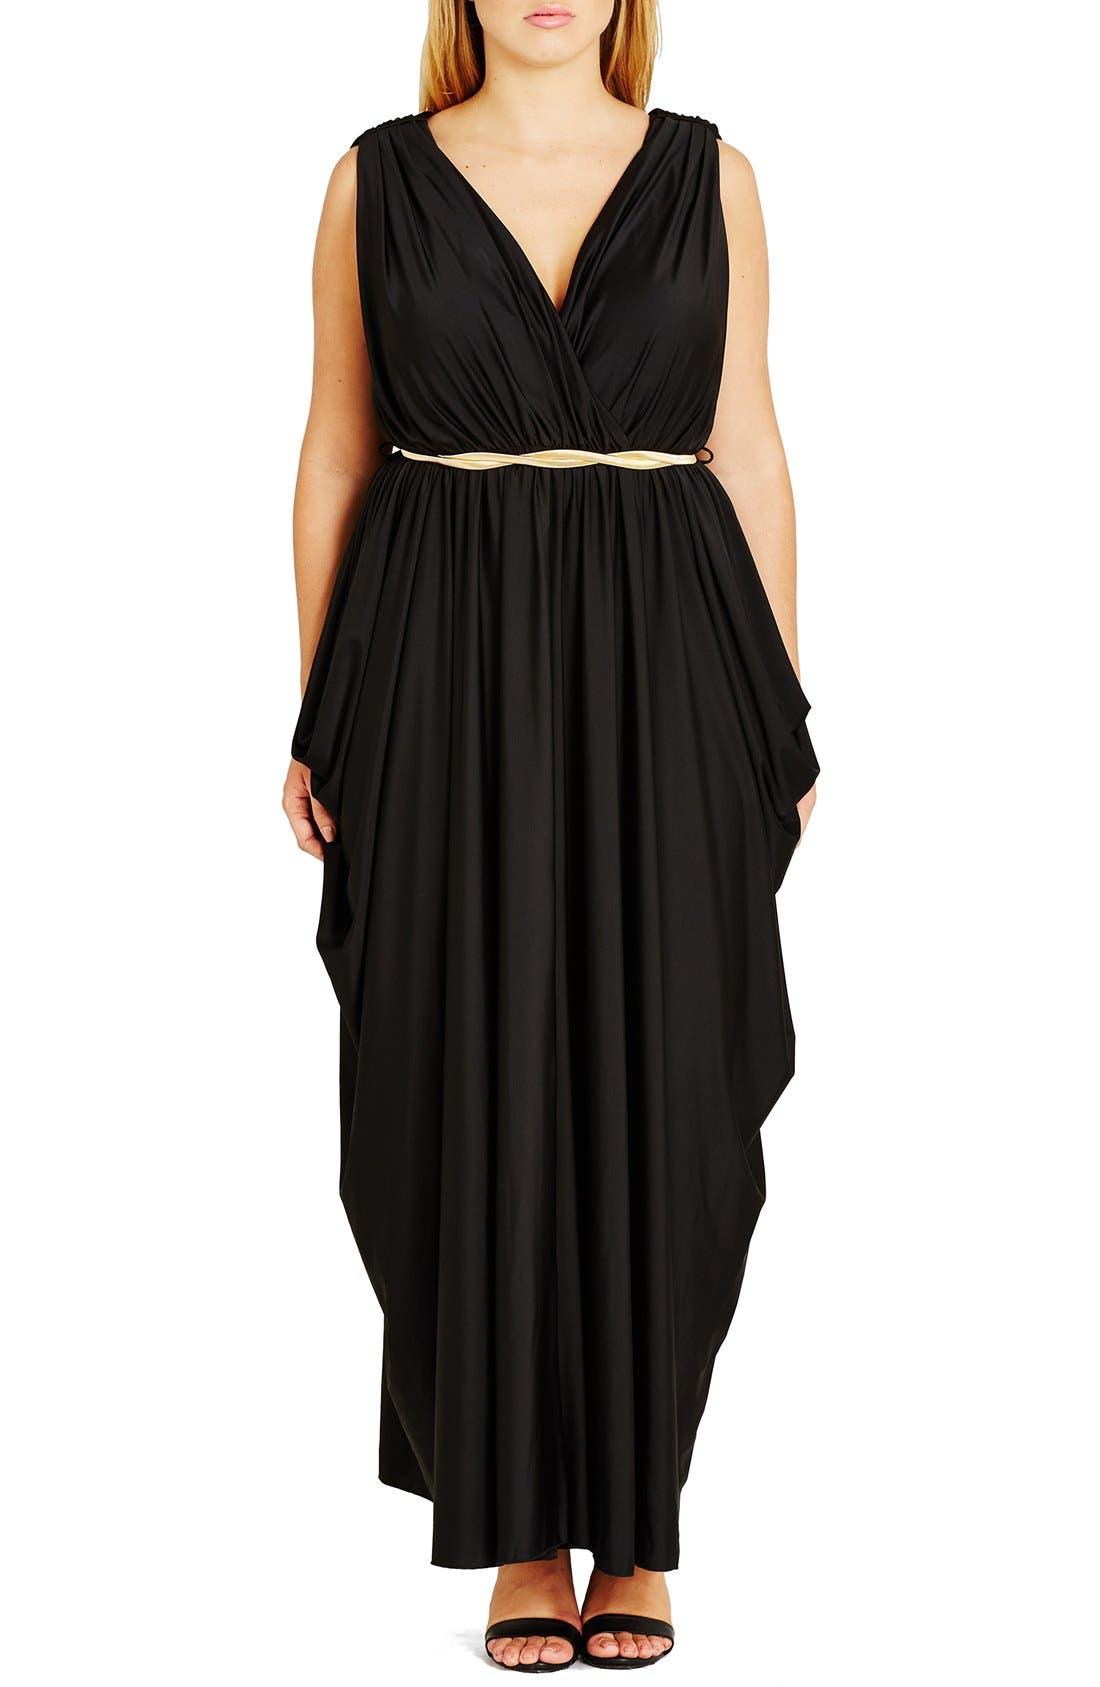 Alternate Image 1 Selected - City Chic 'Athena Goddess' Maxi Dress (Plus Size)